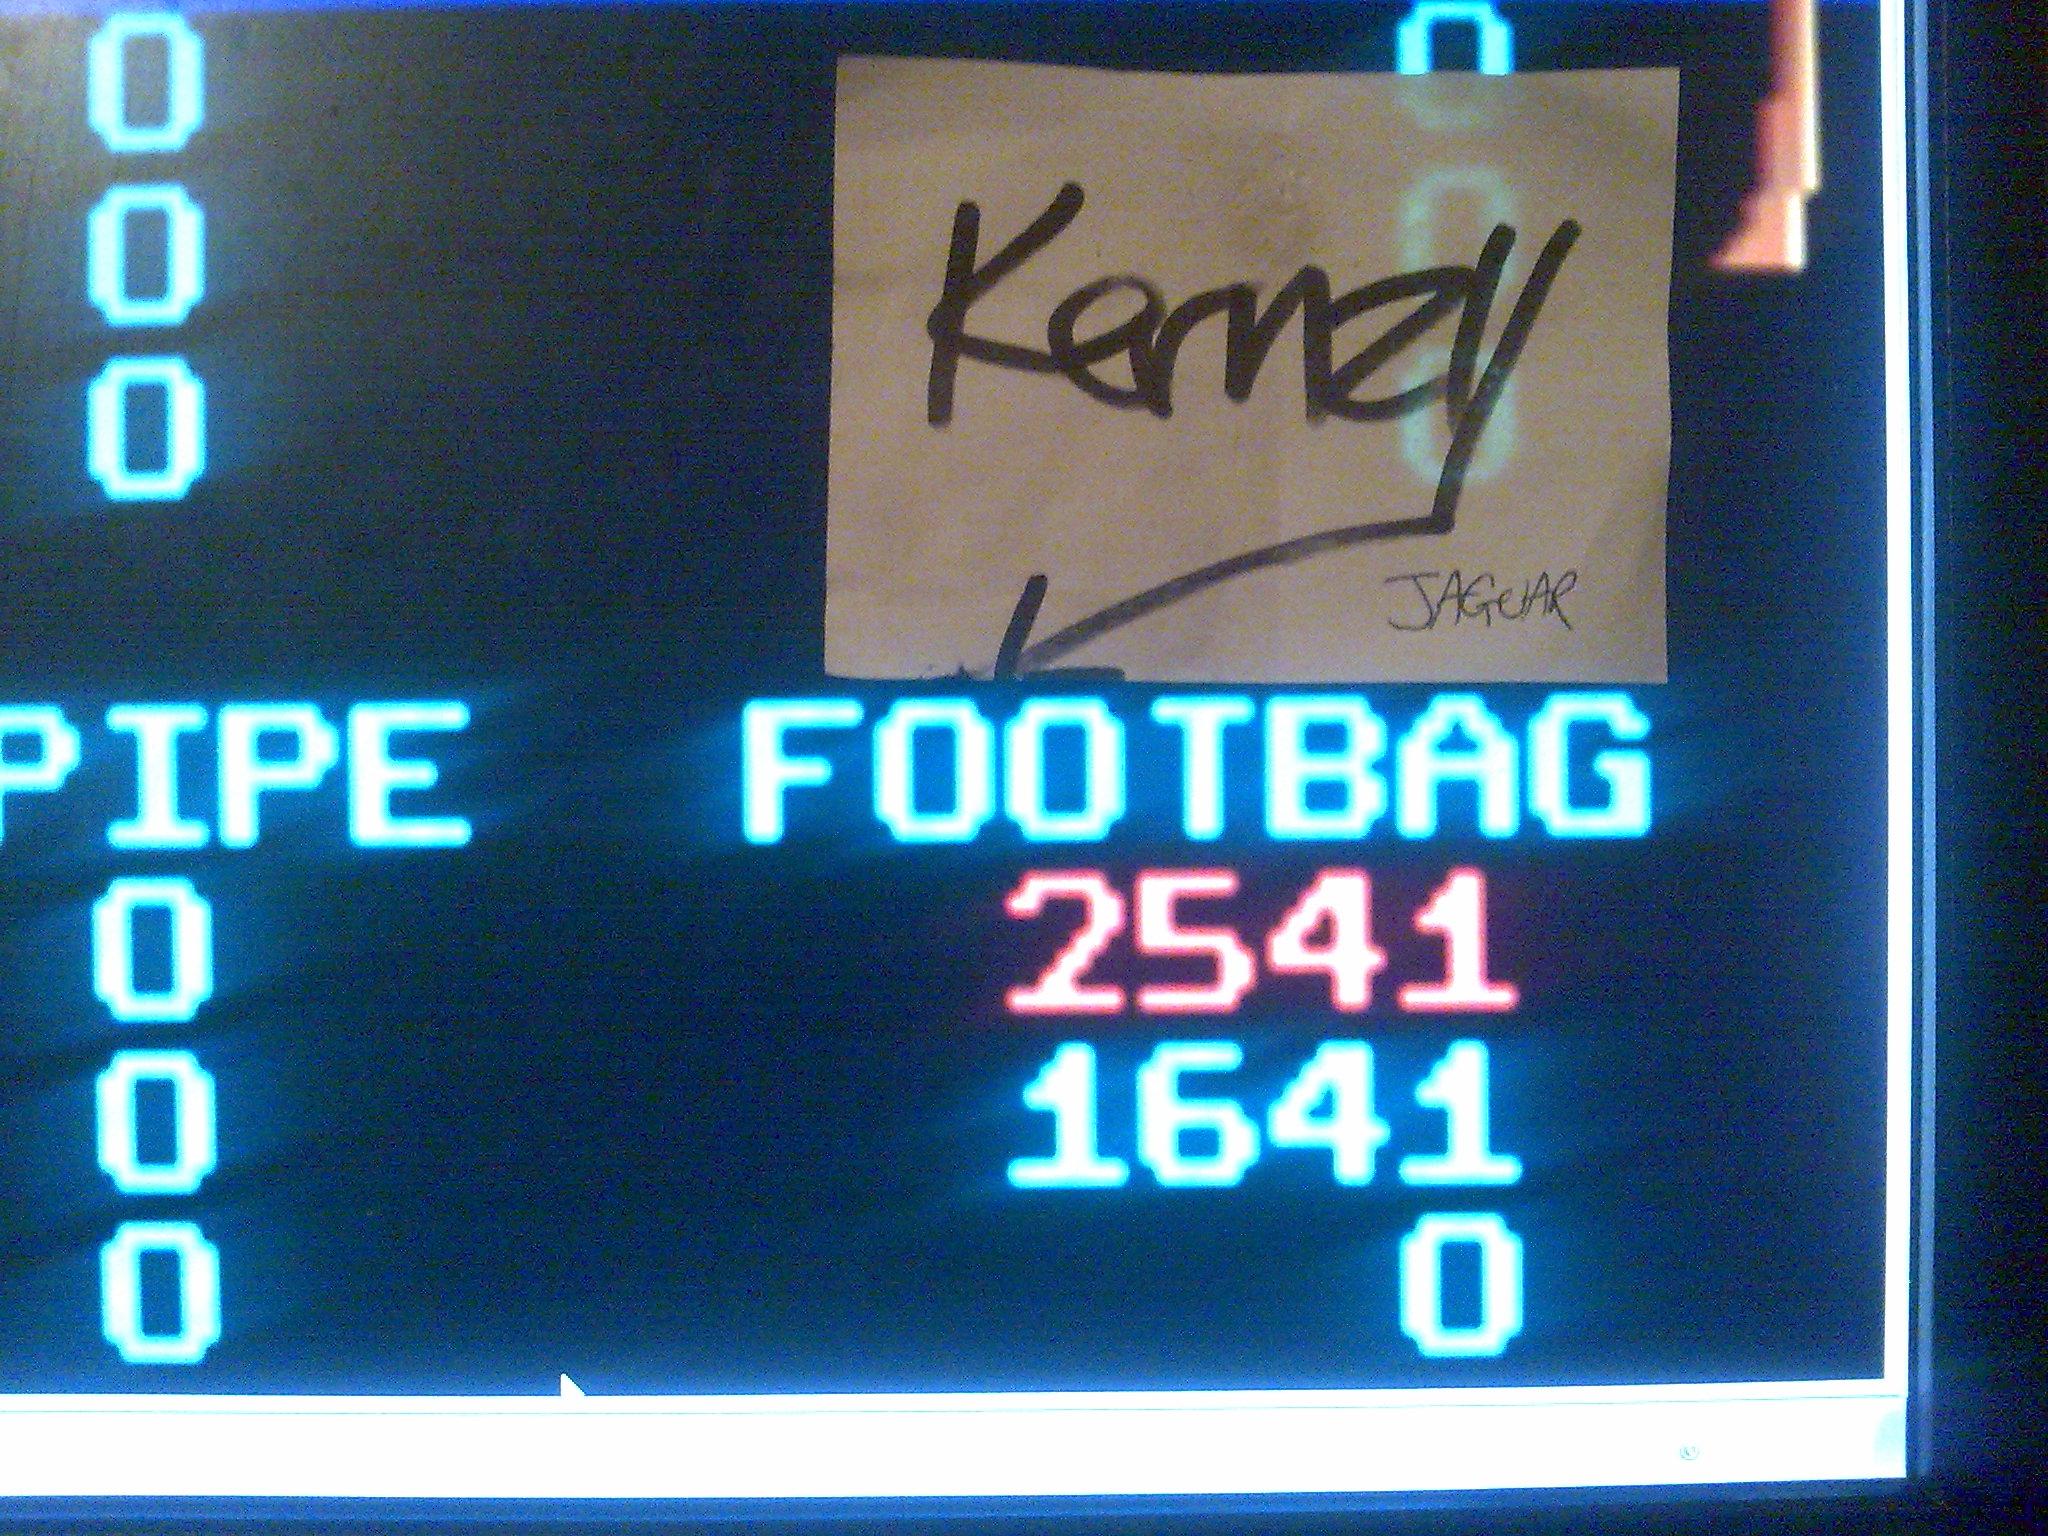 kernzy: California Games: Footbag (Atari Lynx Emulated) 2,541 points on 2014-10-12 07:43:55